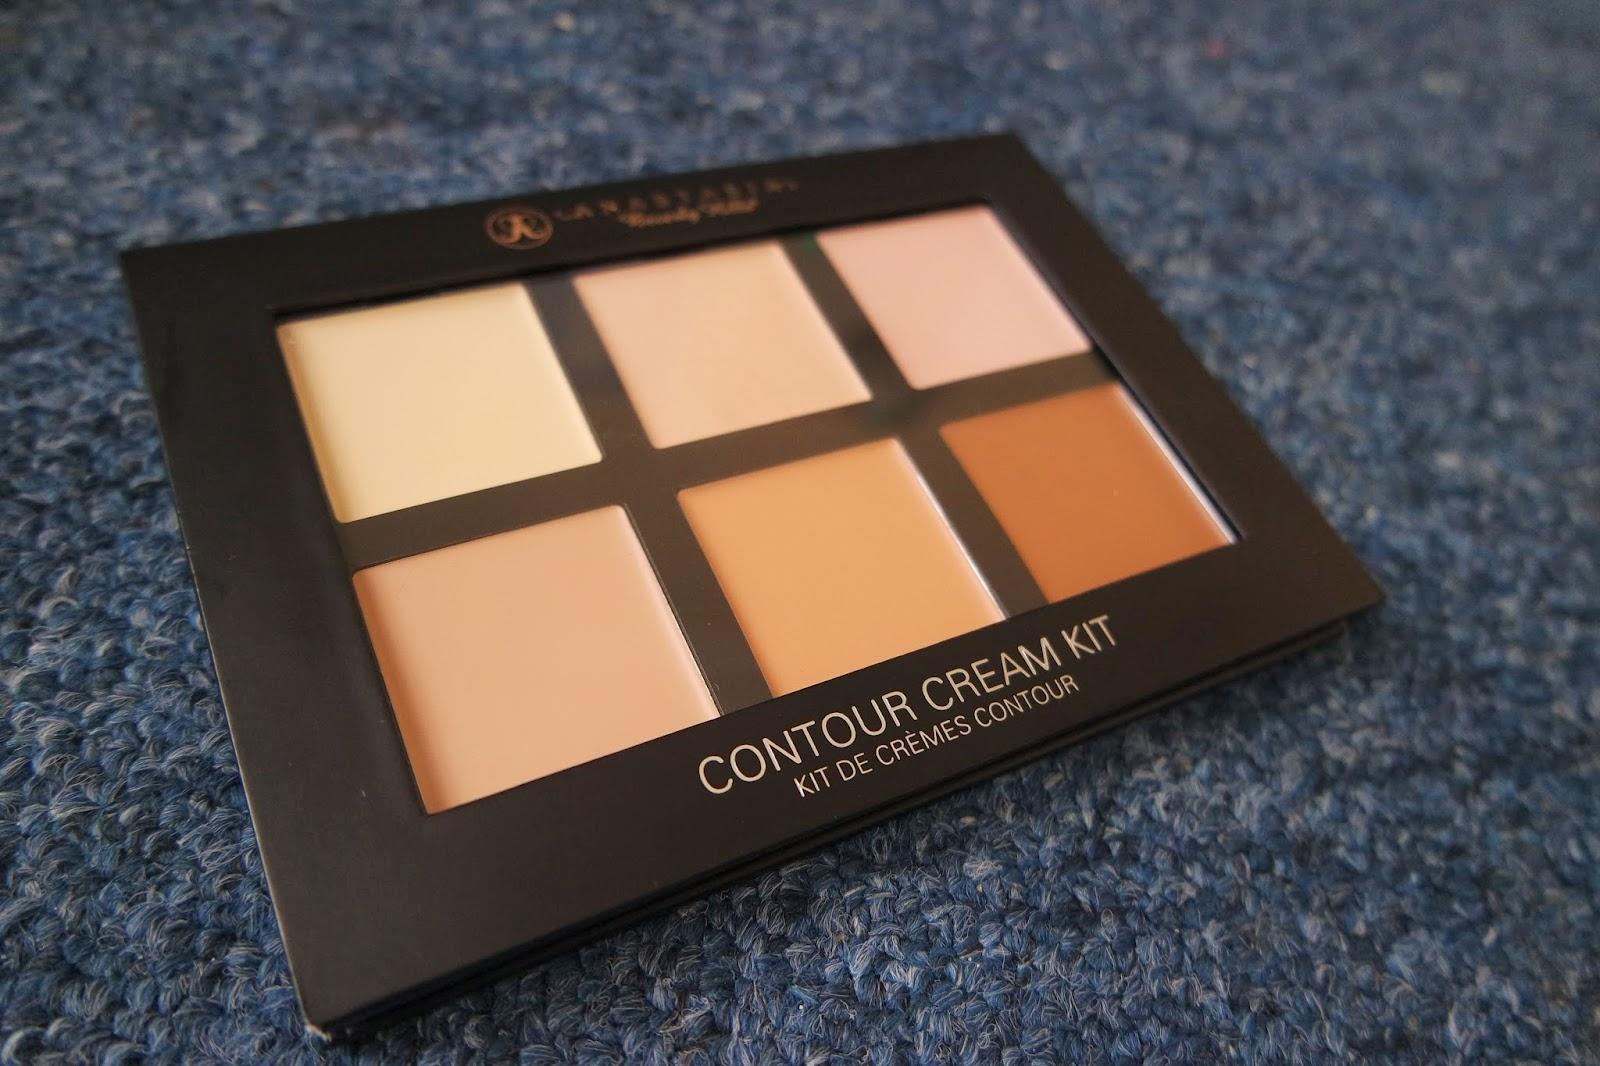 Contouring: The Anastasia Beverly Hills Contour Cream Kit